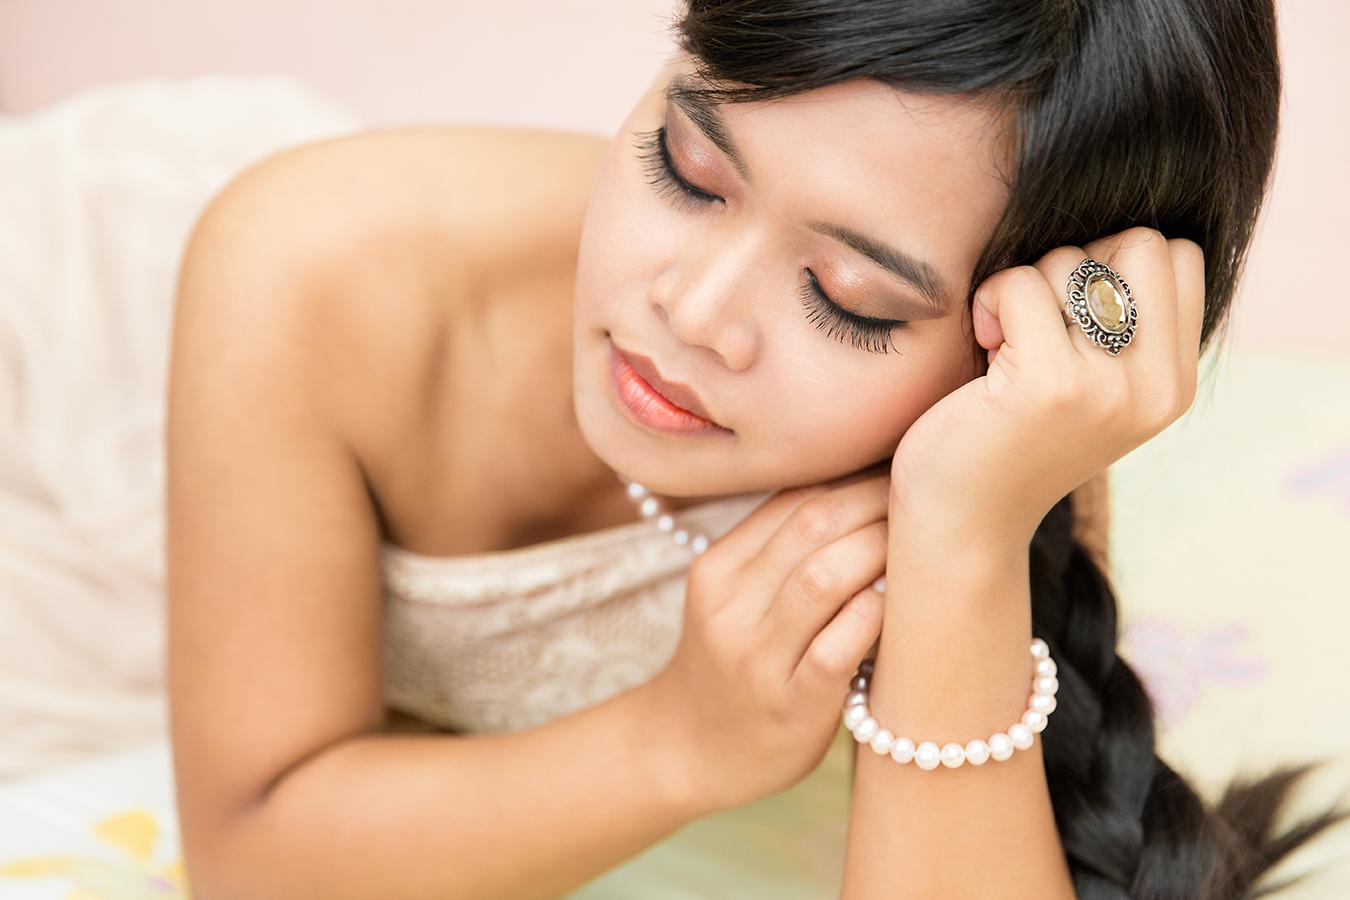 Photographer: Grace Lye Model: Rearya Dhyrimuh Syathue